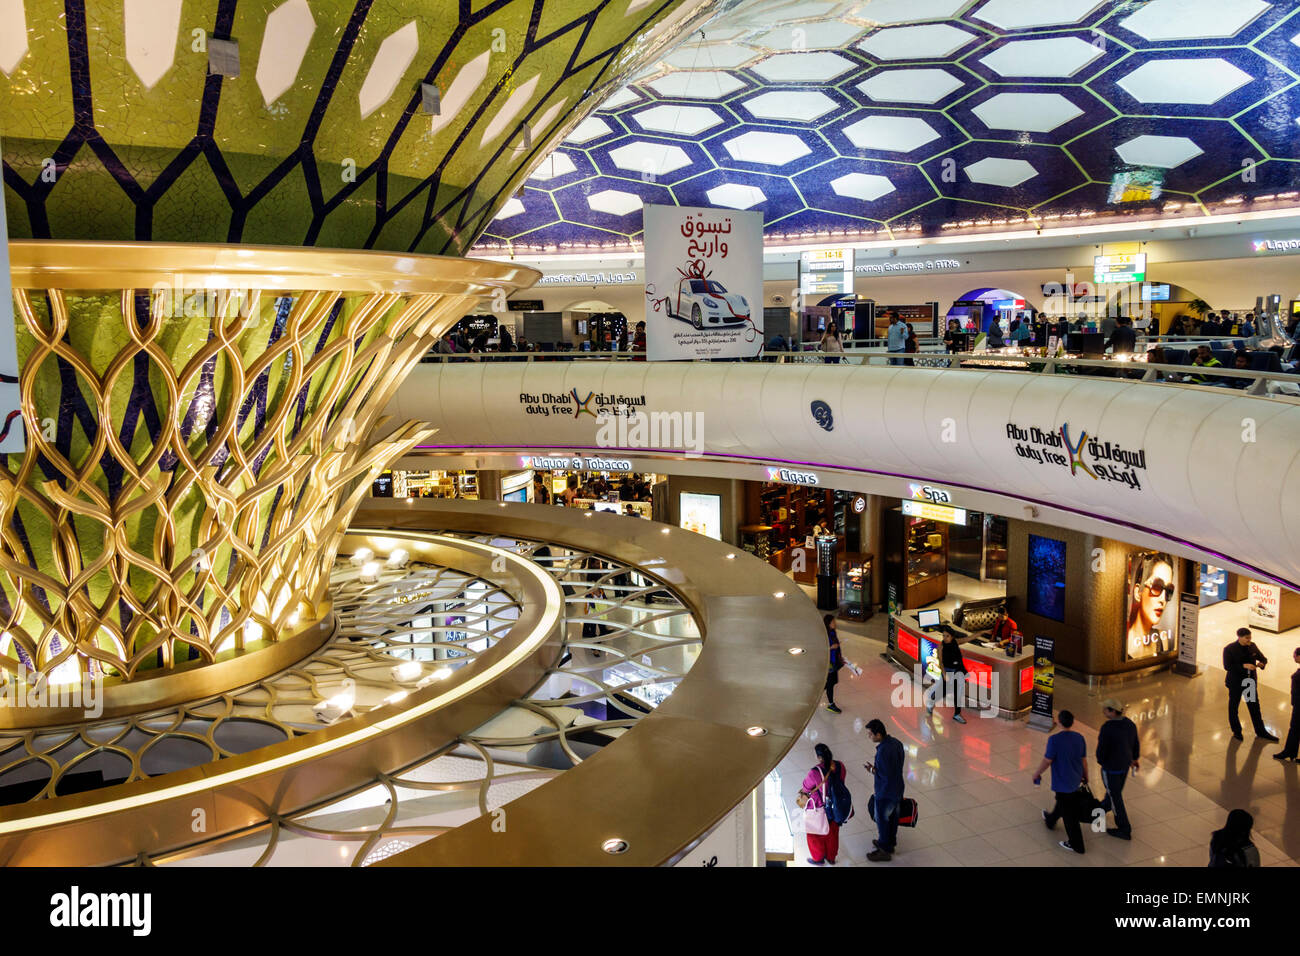 Abu dhabi airport interior stockfotos abu dhabi airport for Halle innenarchitektur